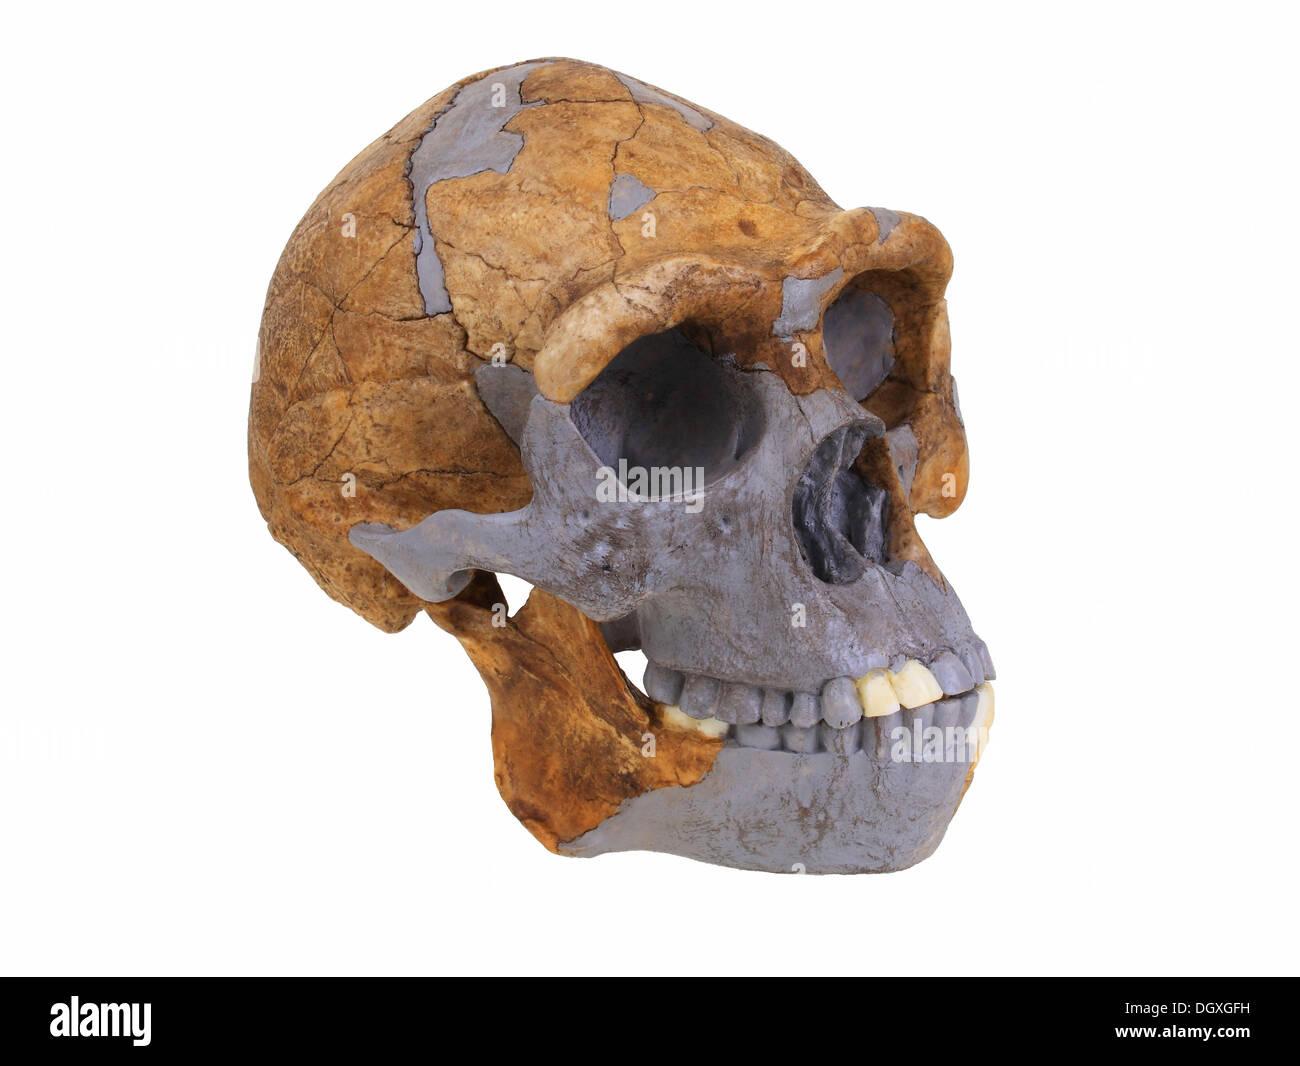 Replica Skull Of Homo Erectus Peking Man Evolution Of